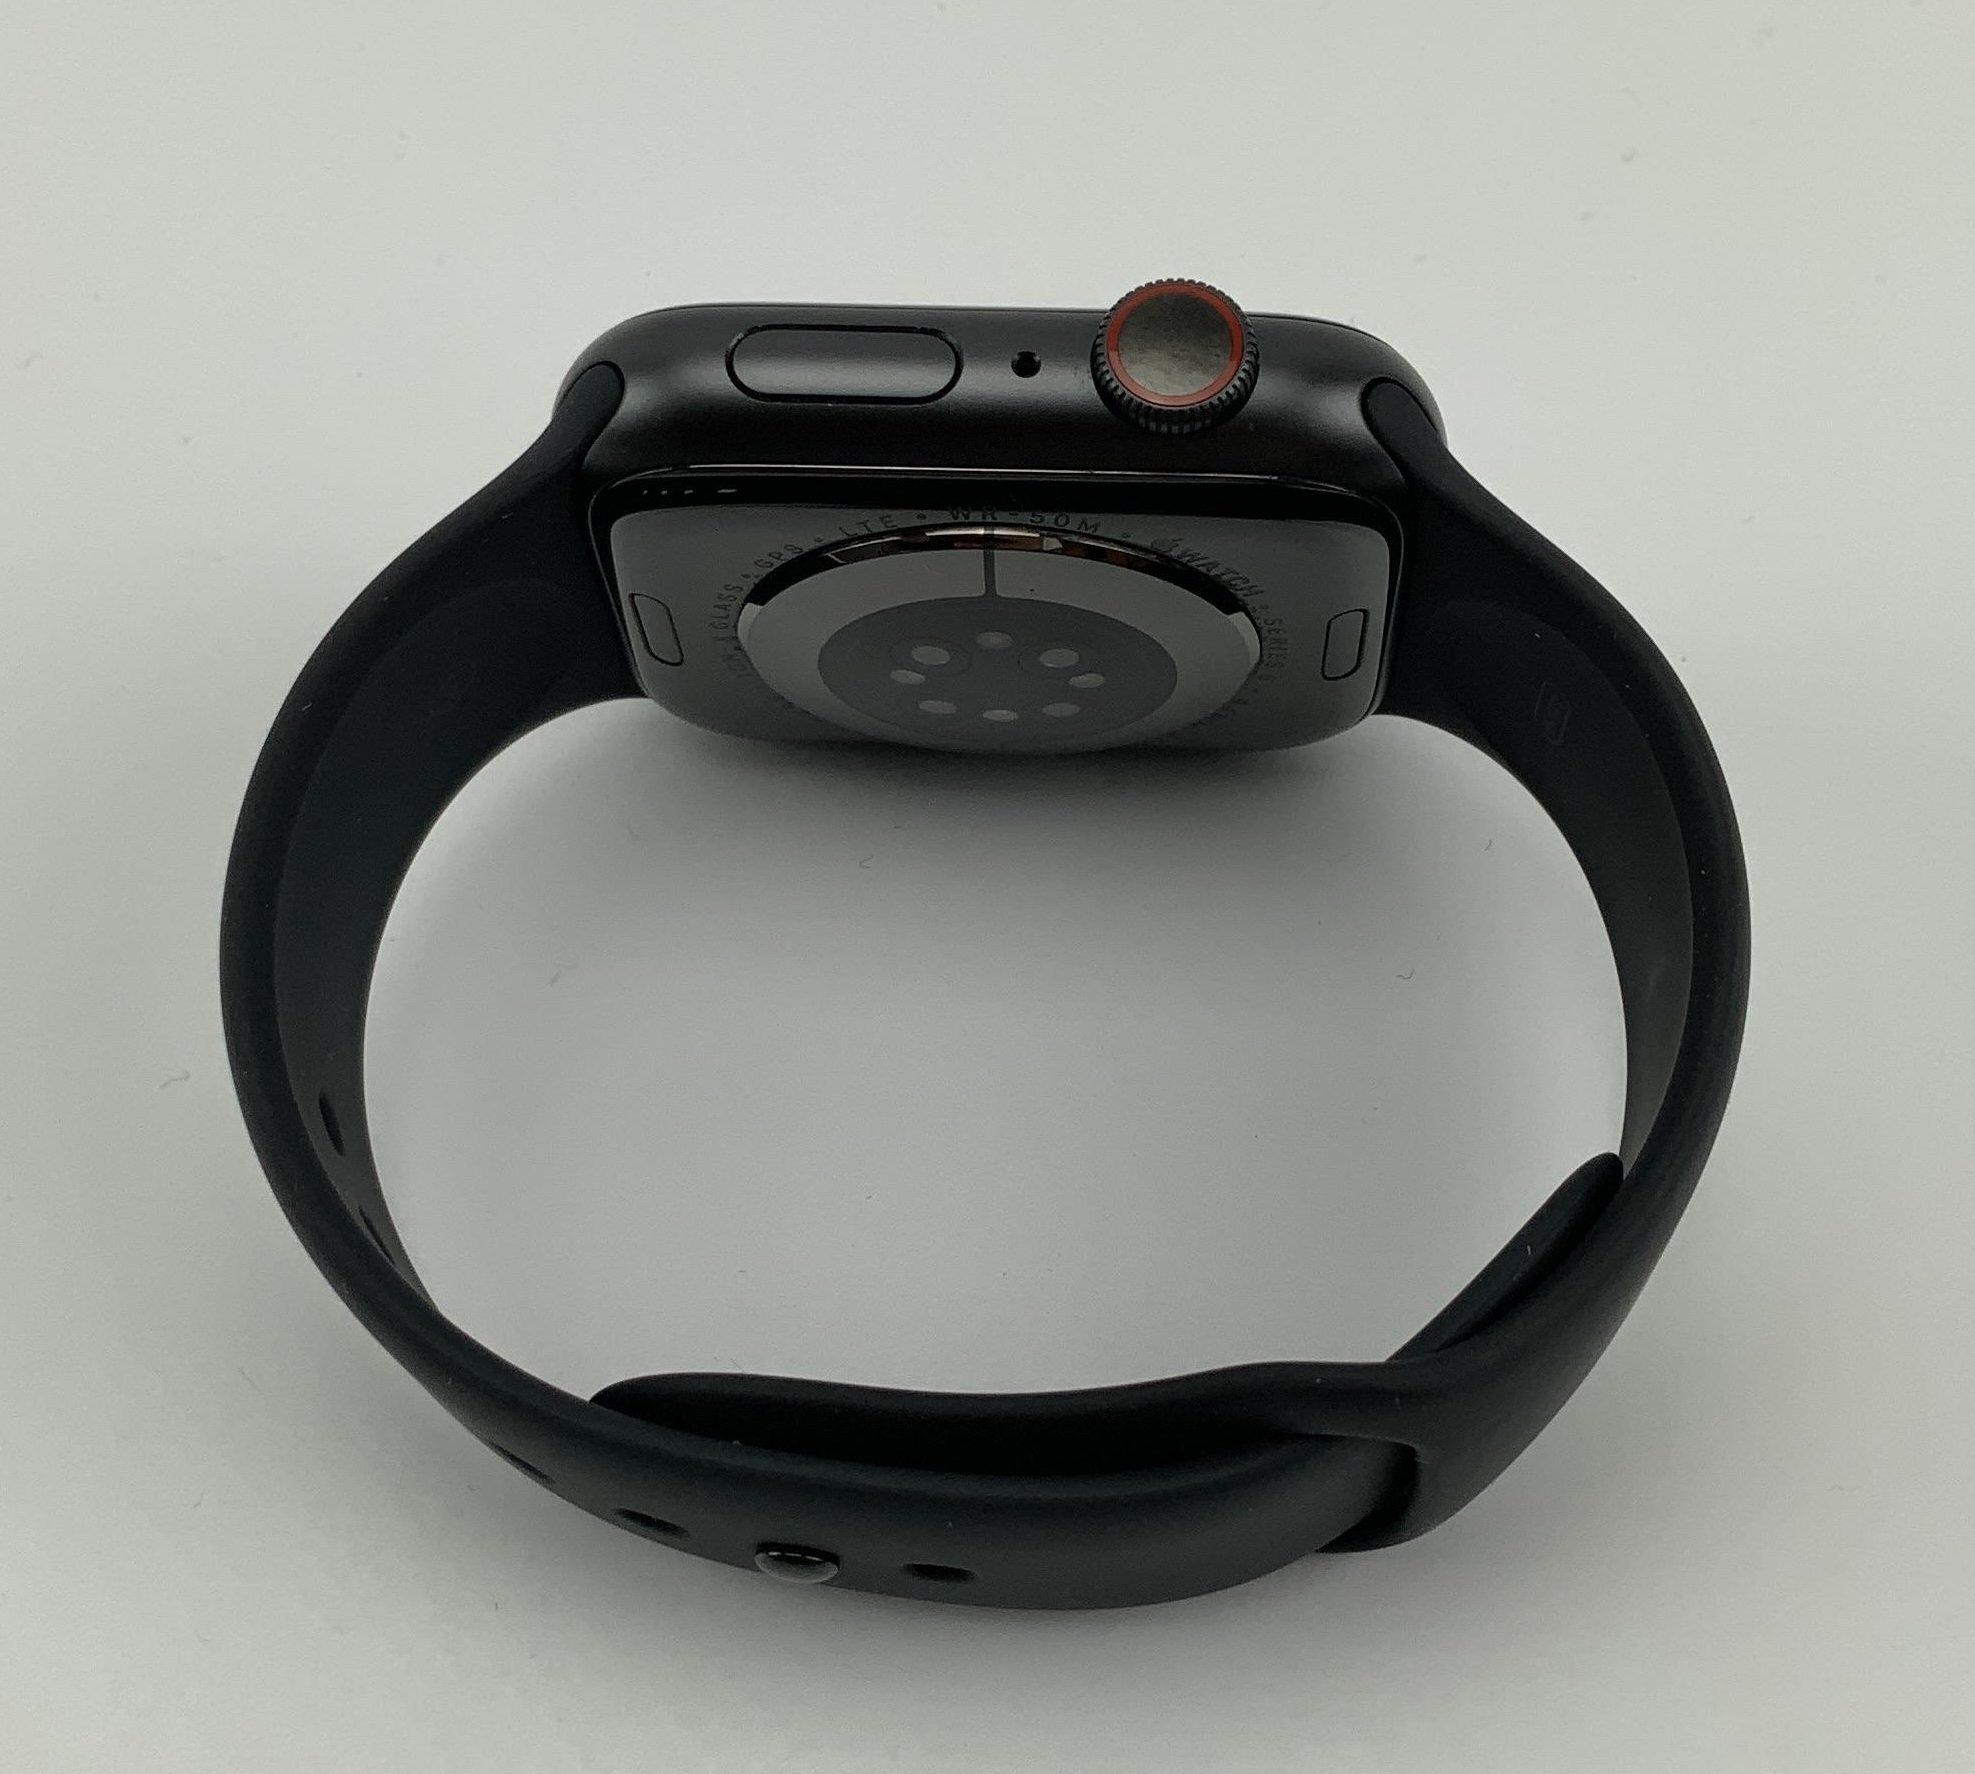 Watch Series 6 Aluminum Cellular (44mm), Space Gray, imagen 2